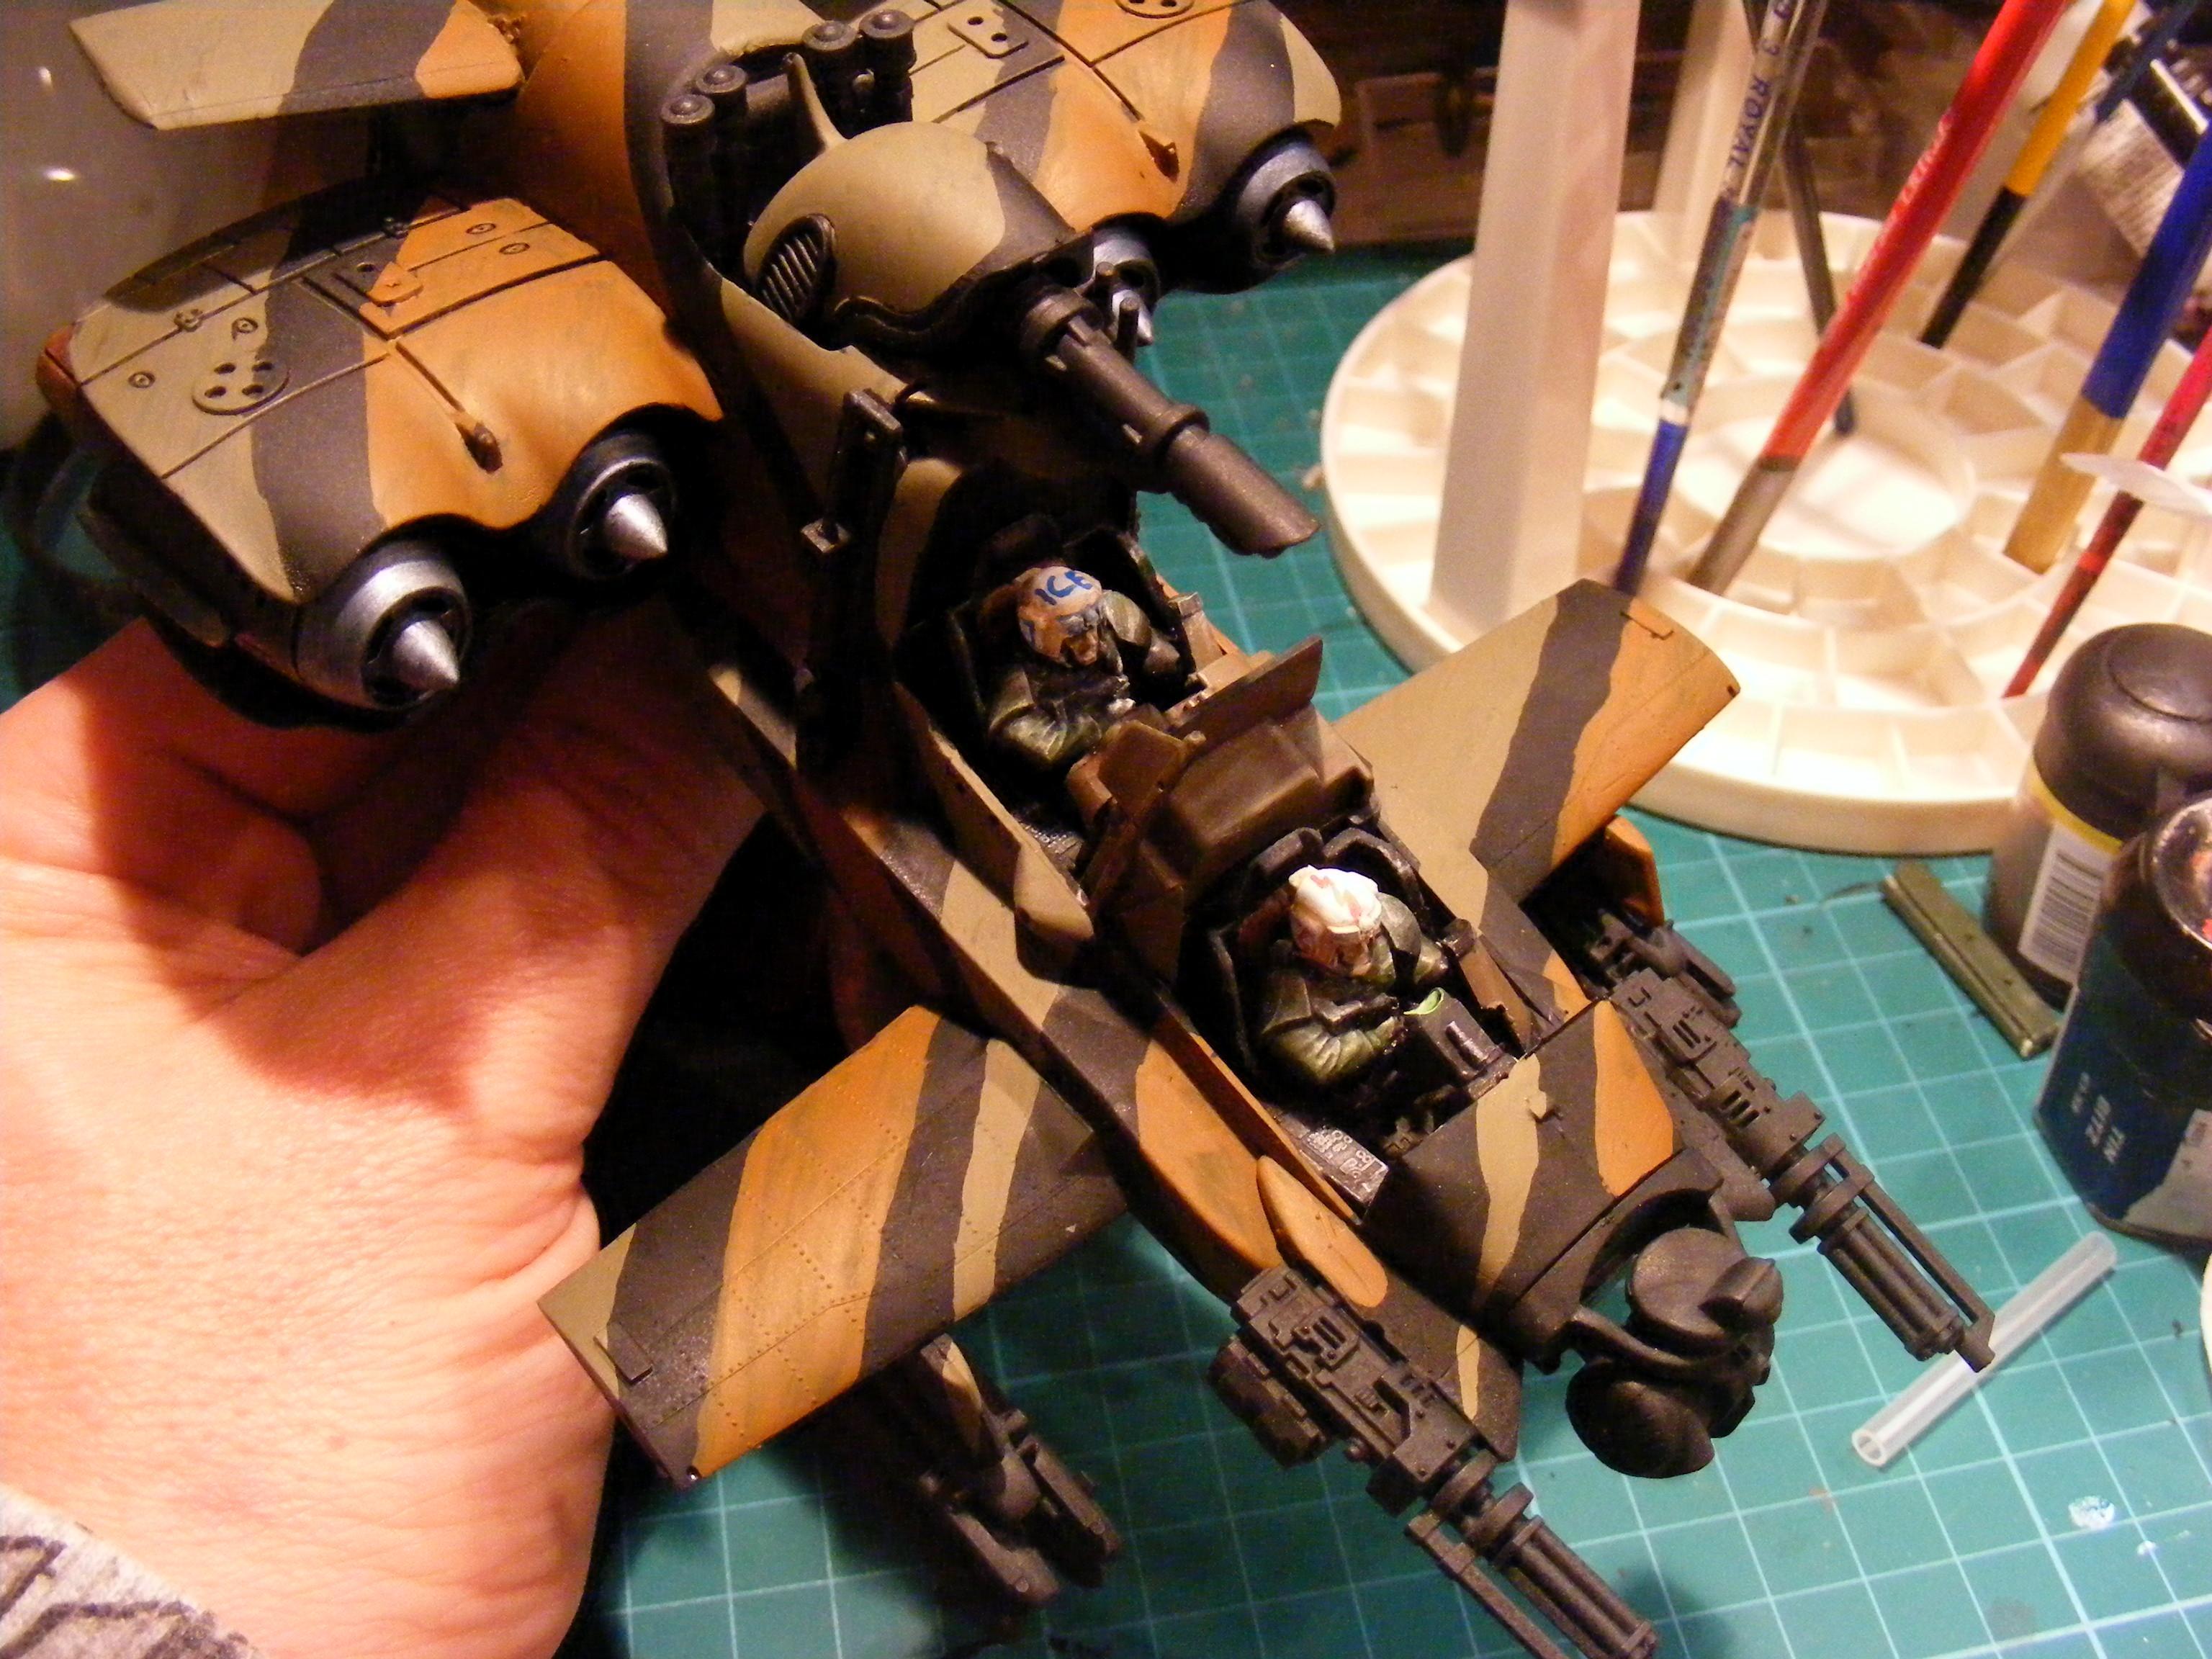 Flyer, Imperial Guard, Valkerie, Vulture, Work In Progress